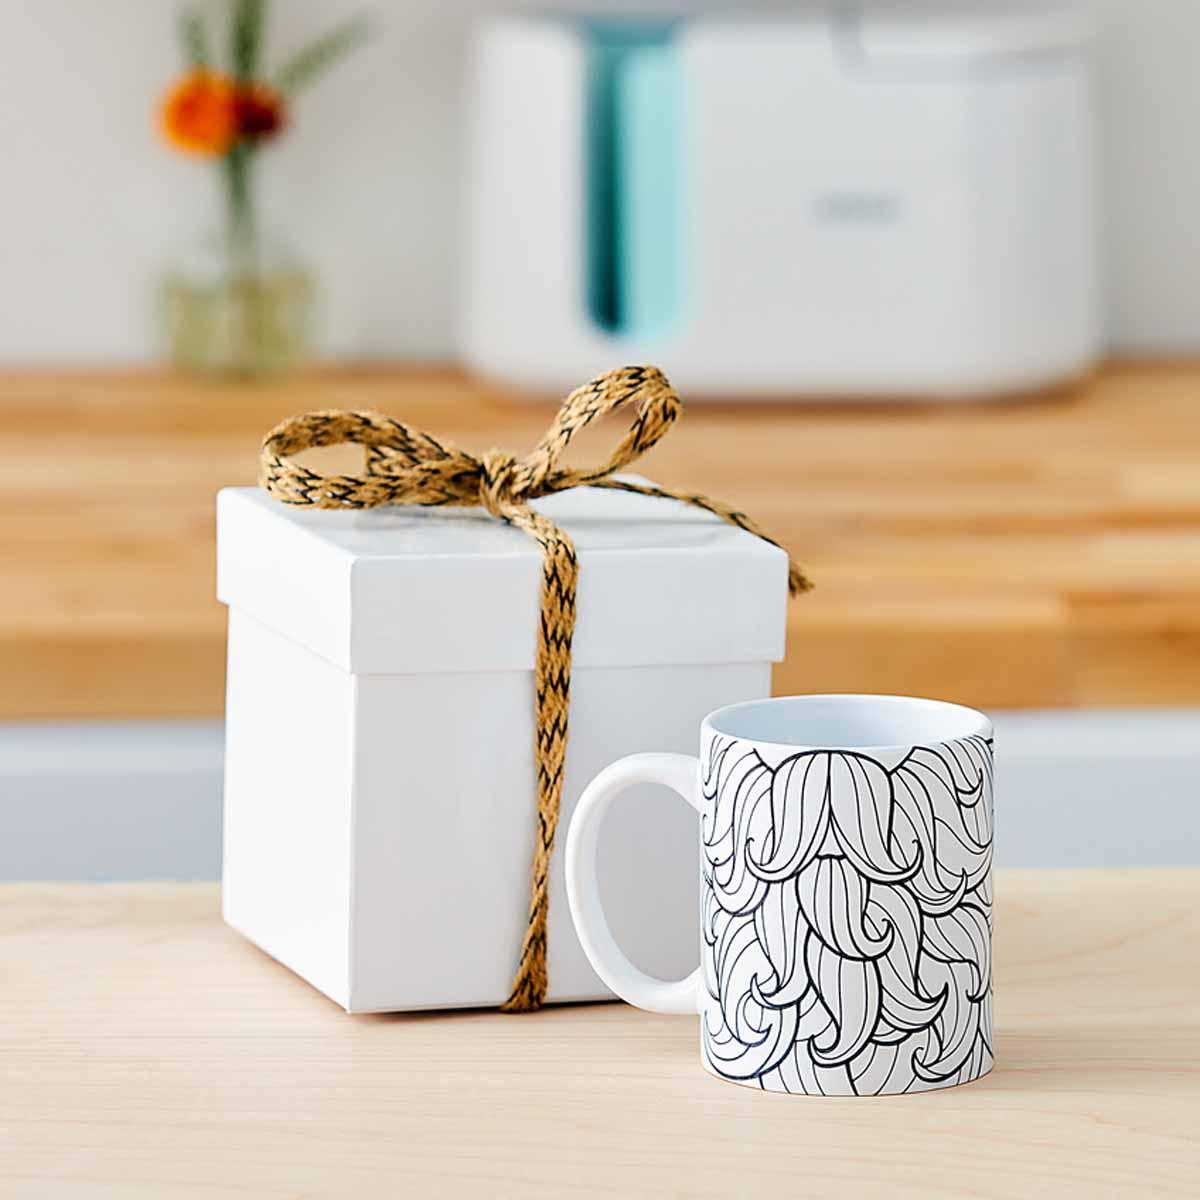 DIY mustache mug with gift box